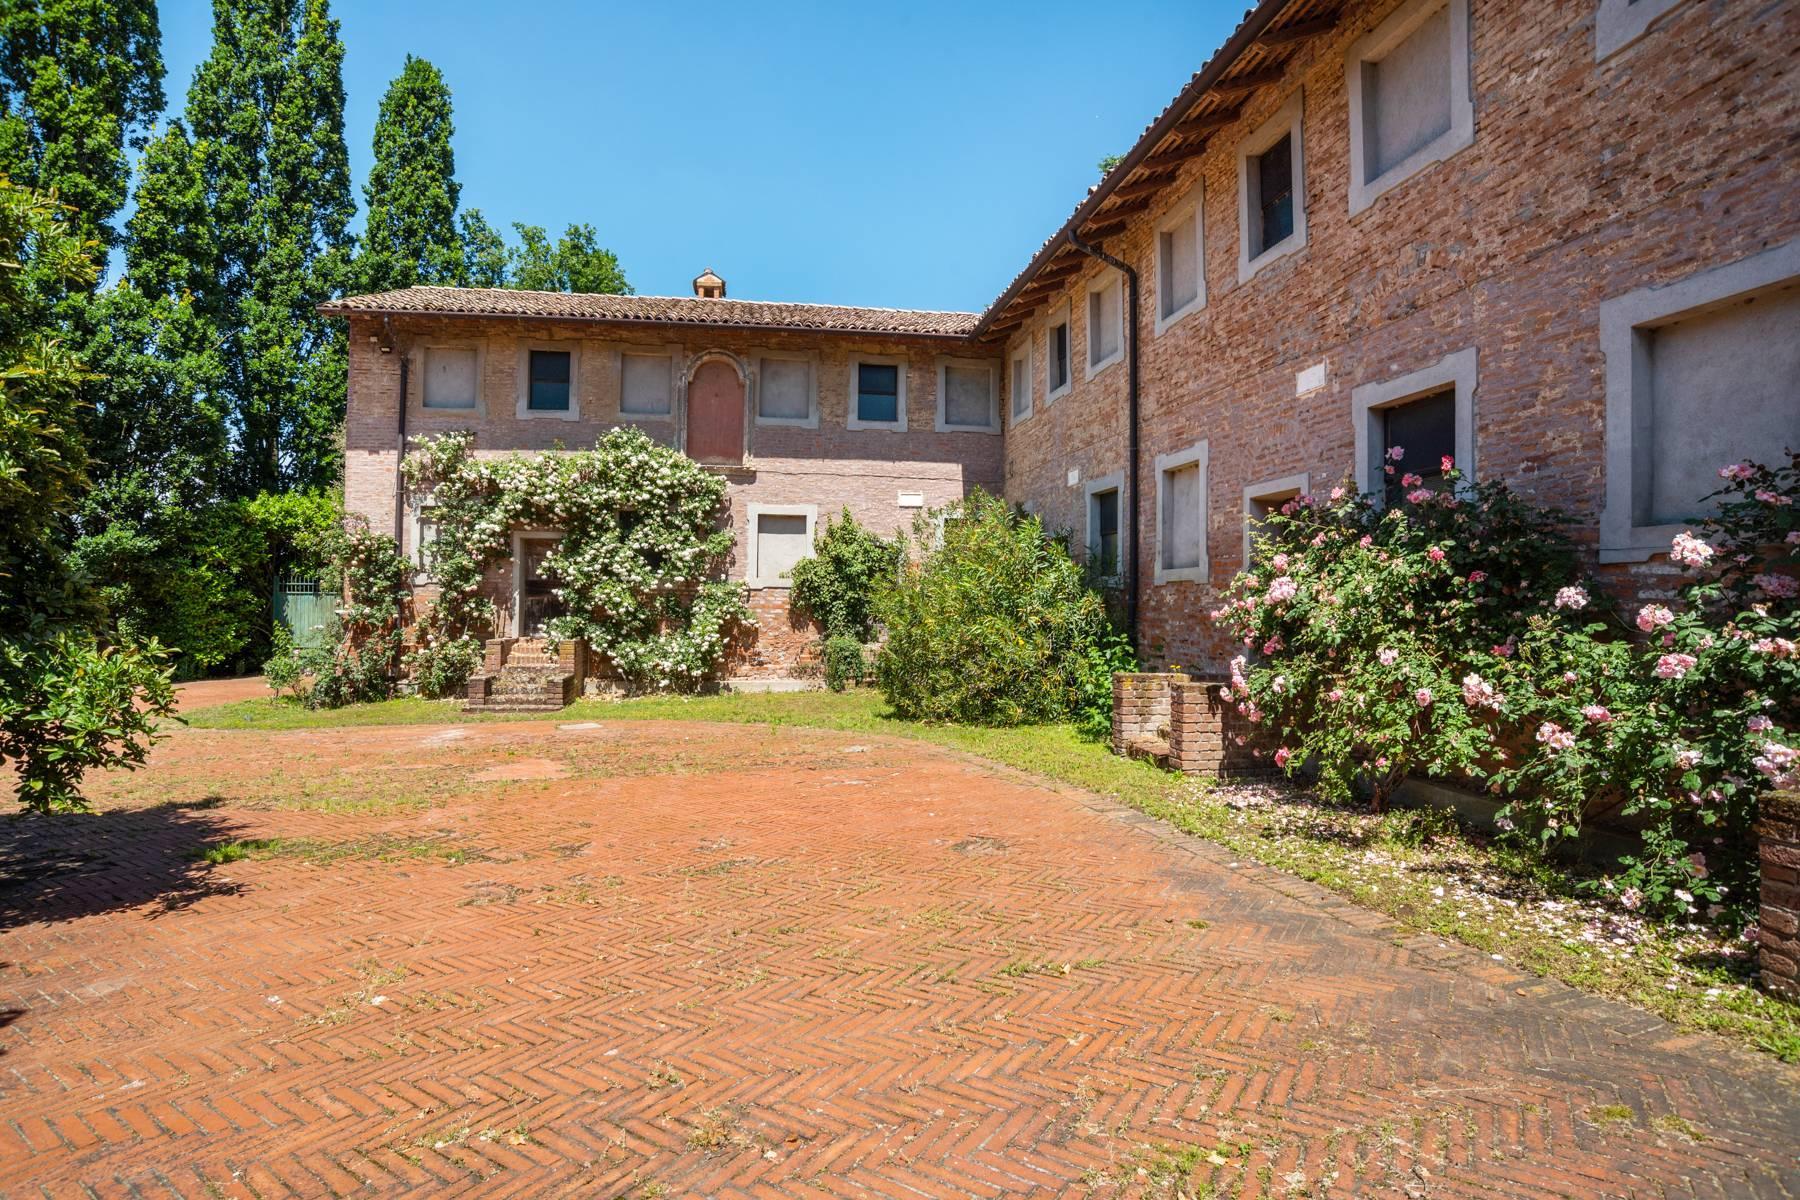 Magnifica proprietà immersa nel verde a Pavia - 9